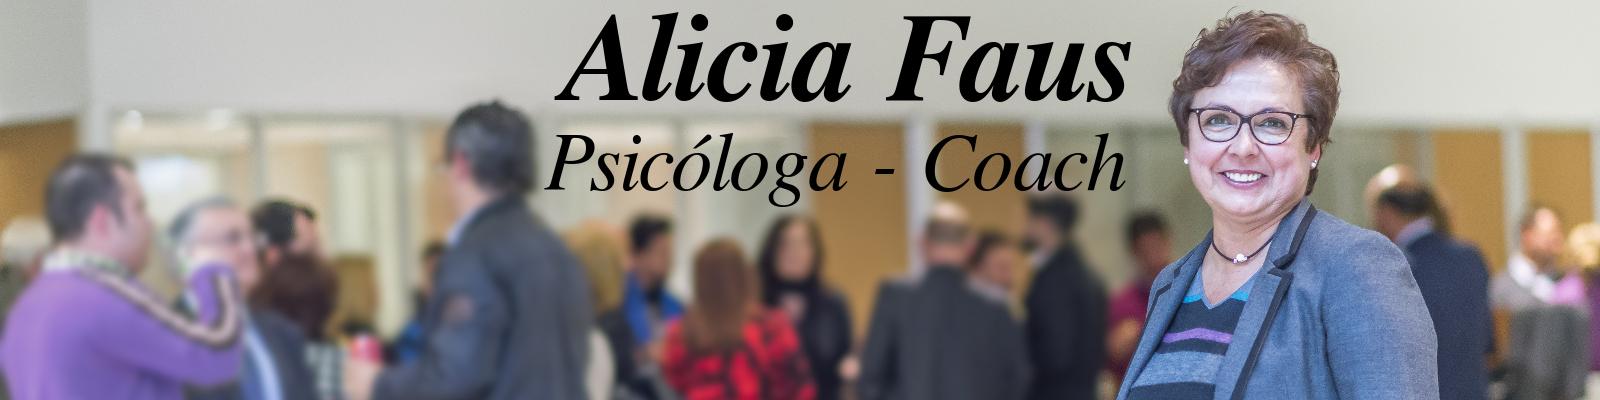 Alicia Faus